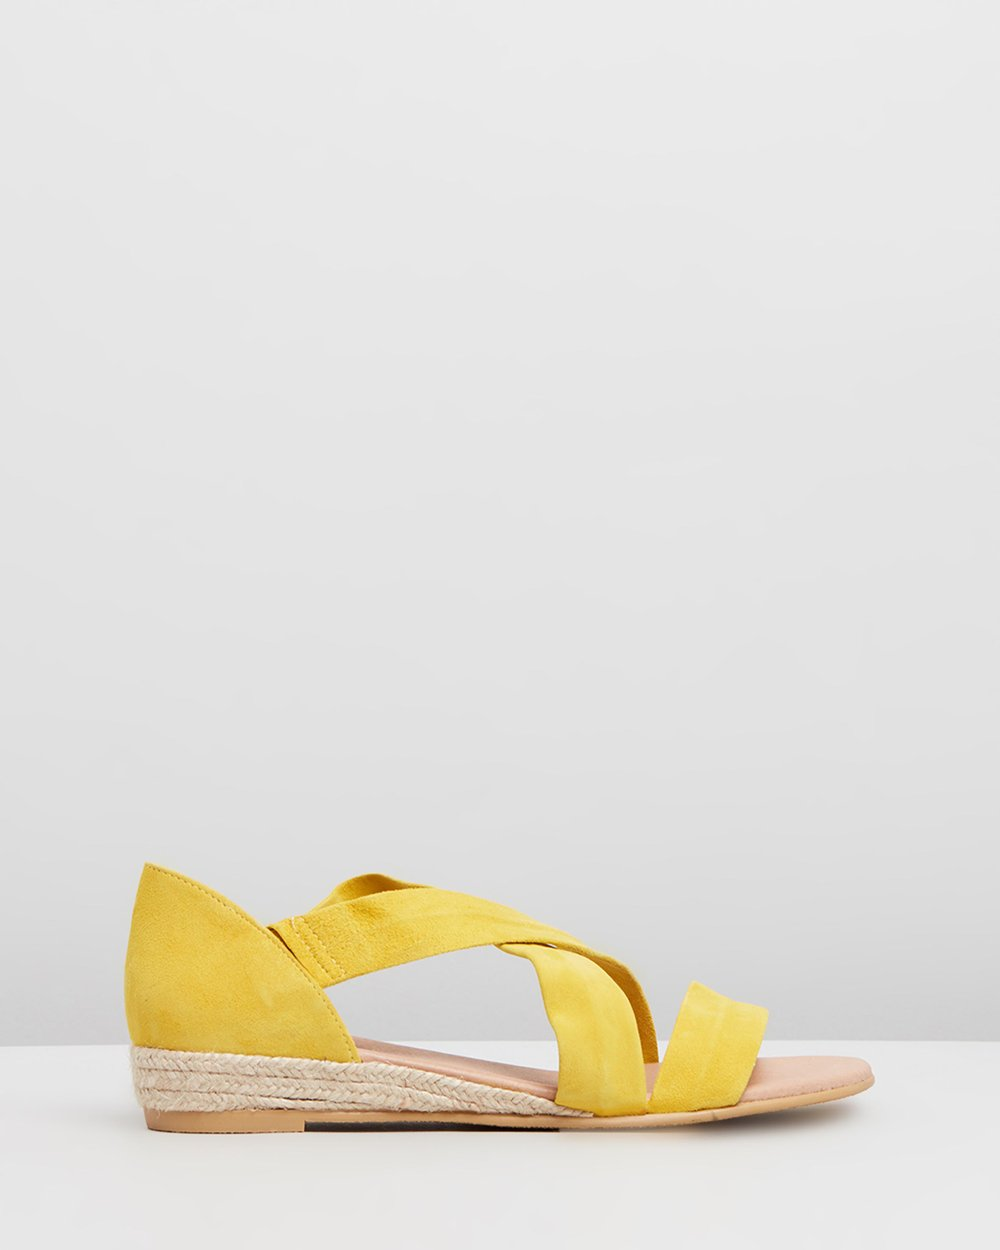 Womens Office Hallie Cross Strap Espadrilles Bright Yellow Suede Sandals